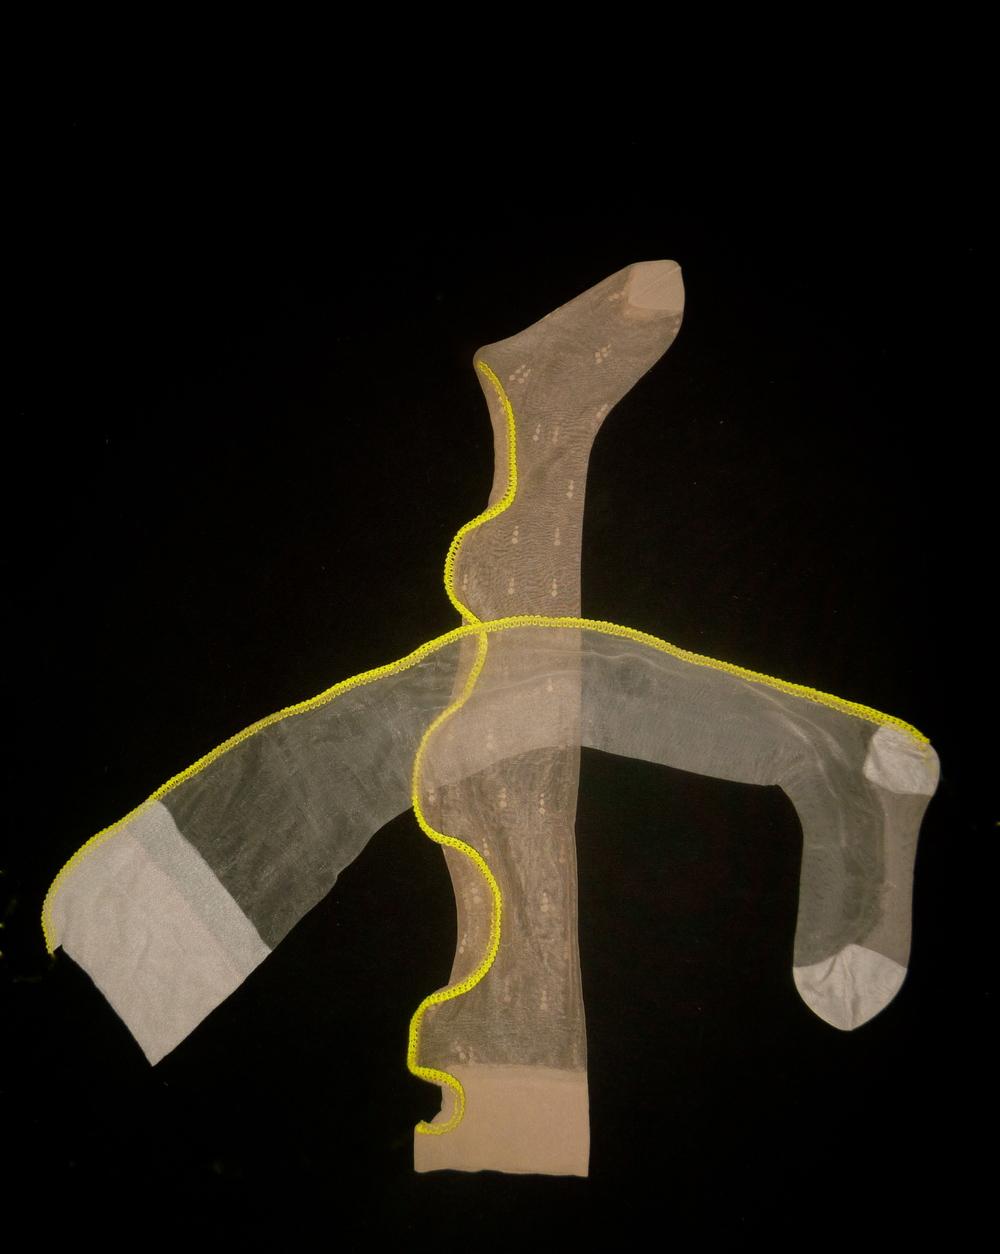 Fotografie, Digital Print auf Bütten, 29x20 cm, Nr.2